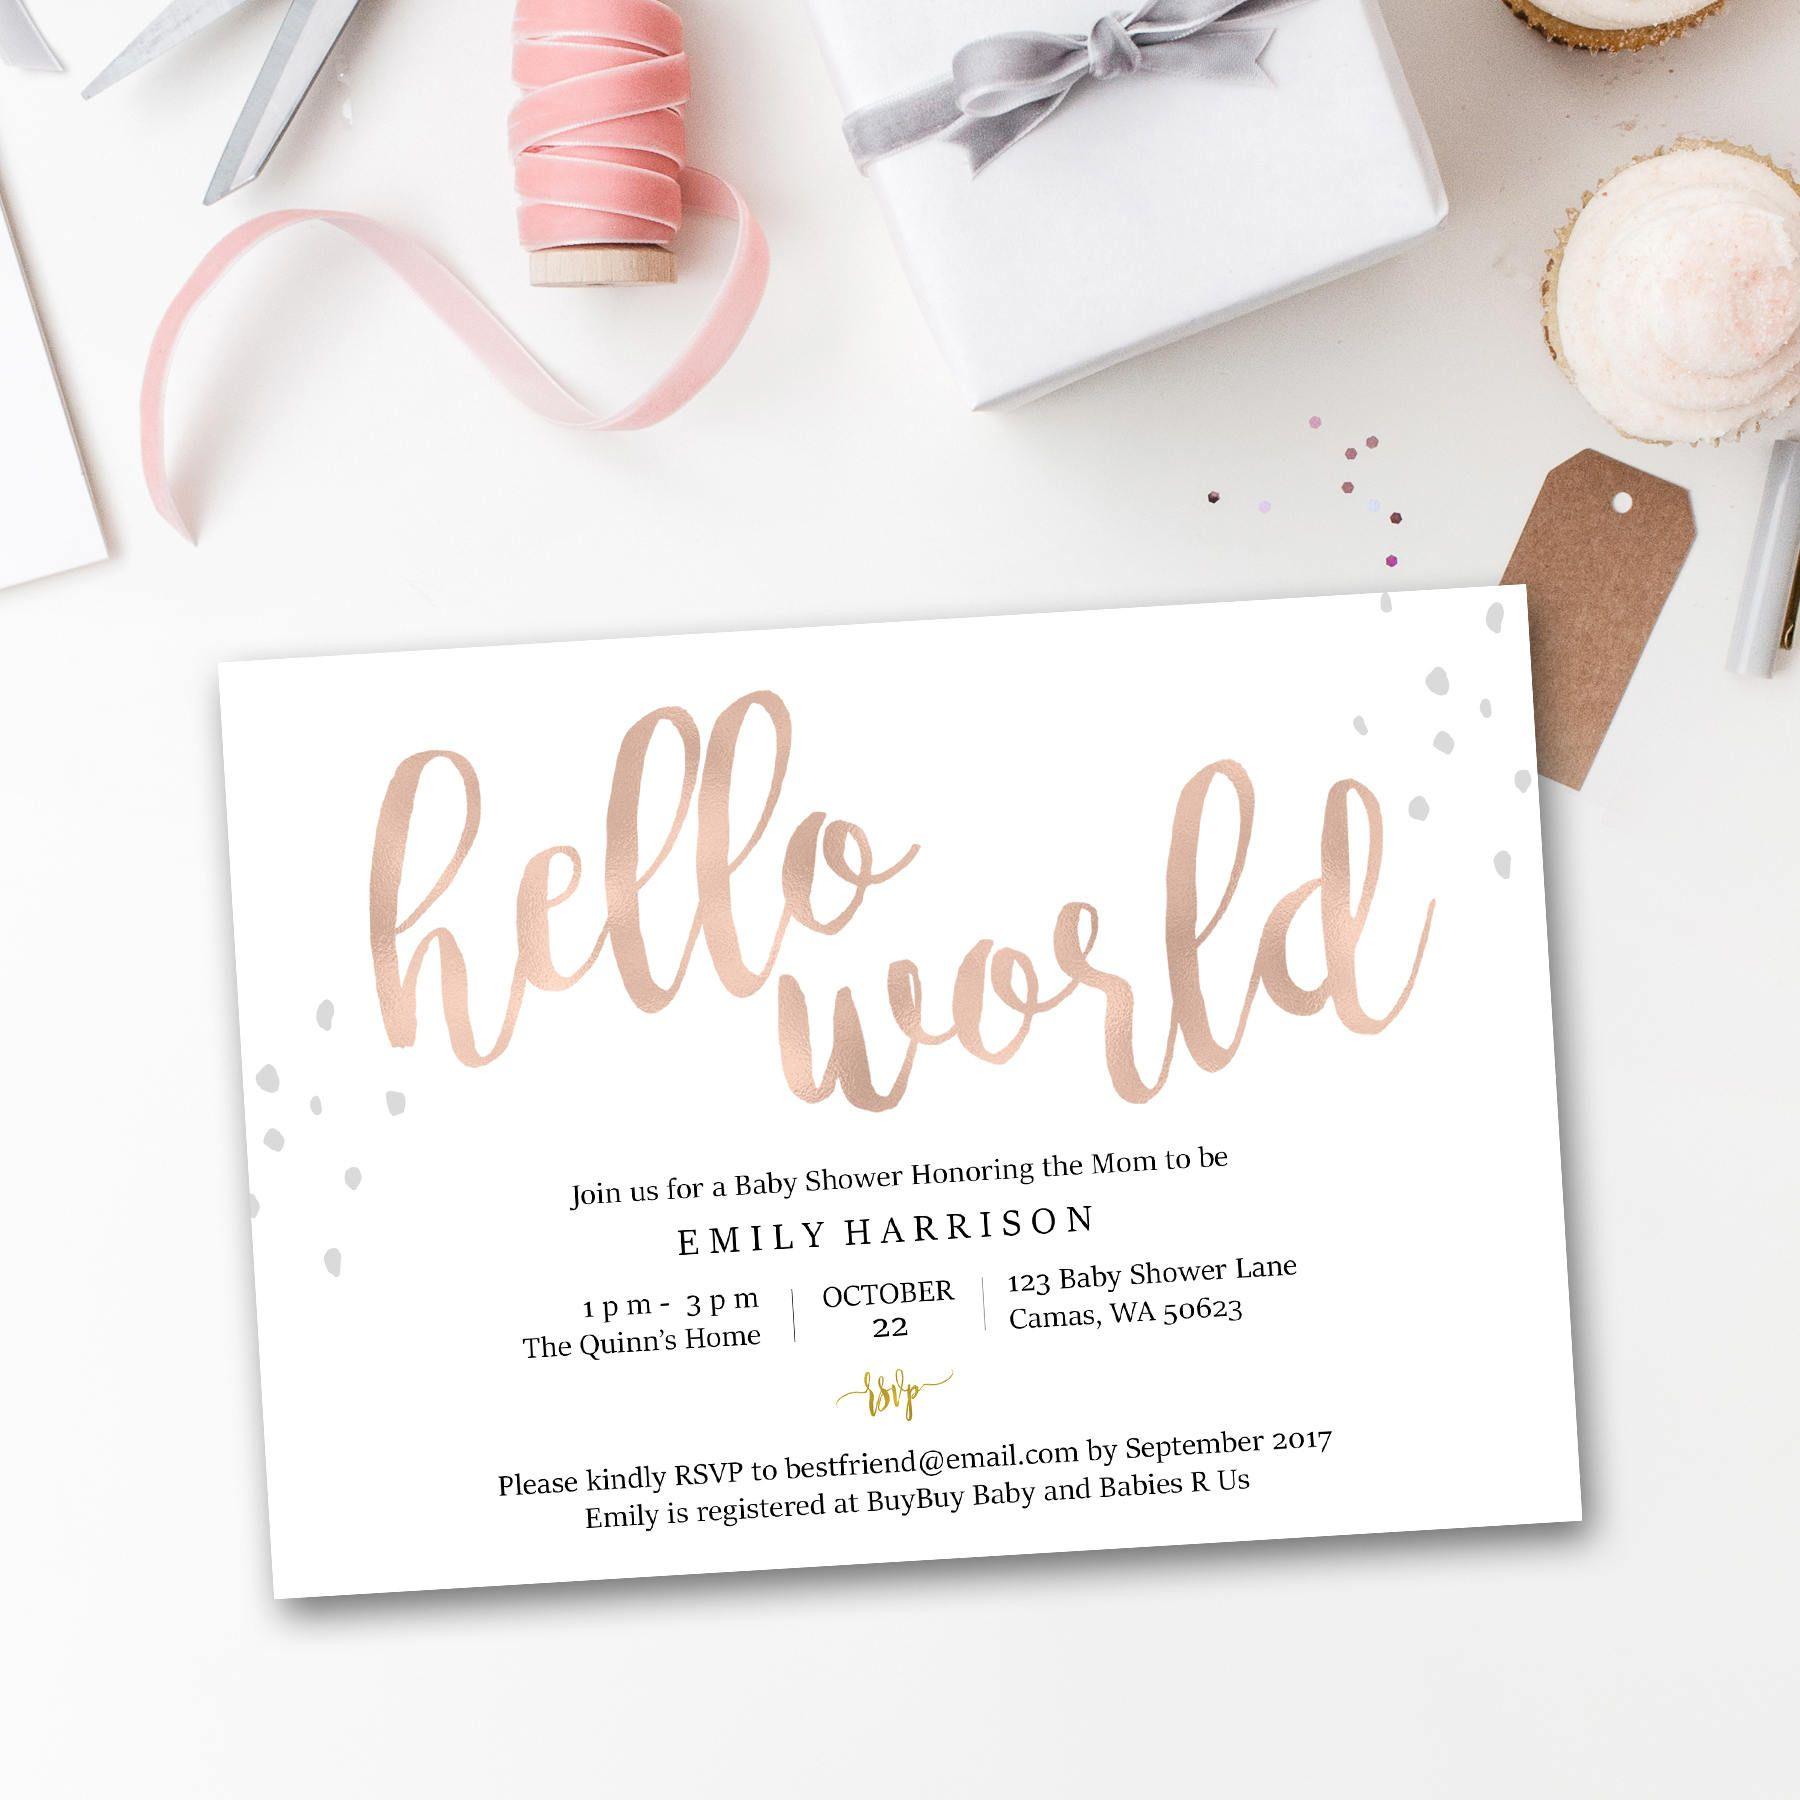 Hello World Baby Shower Invitation Printable Baby Shower Etsy Baby Shower Invitations Rose Gold Baby Shower Baby Shower Inspiration